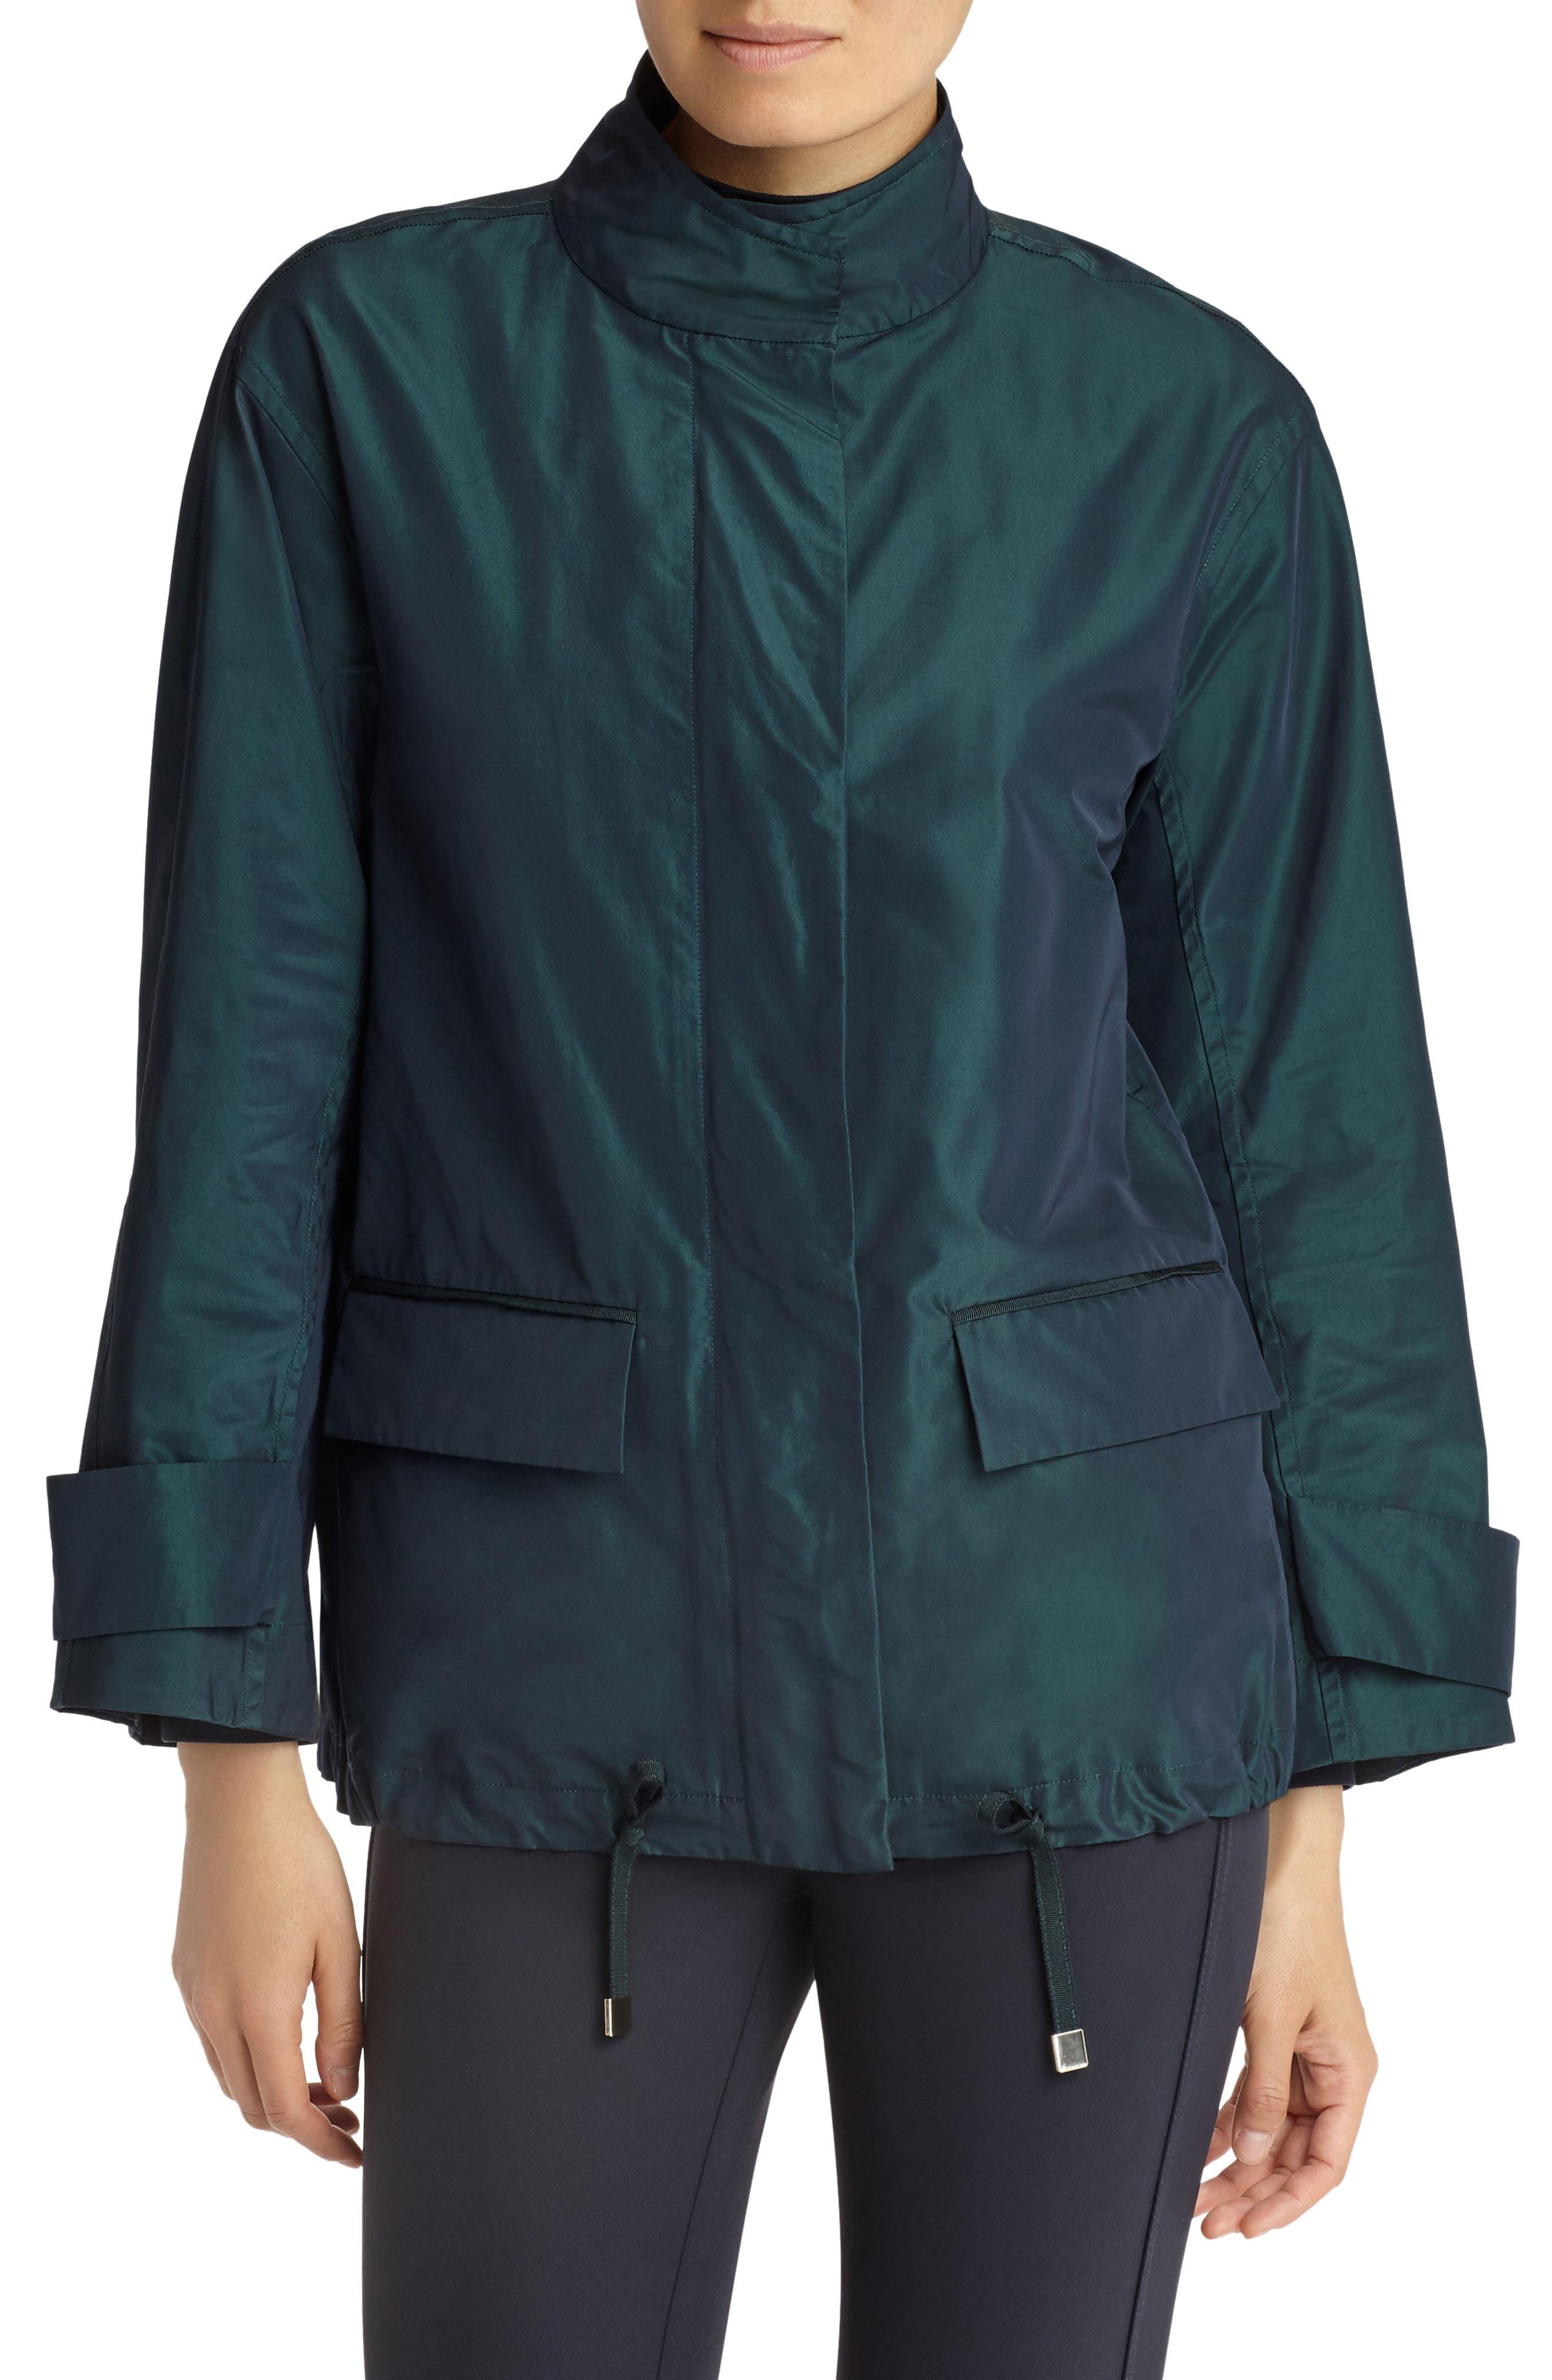 Markus Empirical Tech Cloth Jacket,                         Main,                         color, Blue Spruce Iridescent